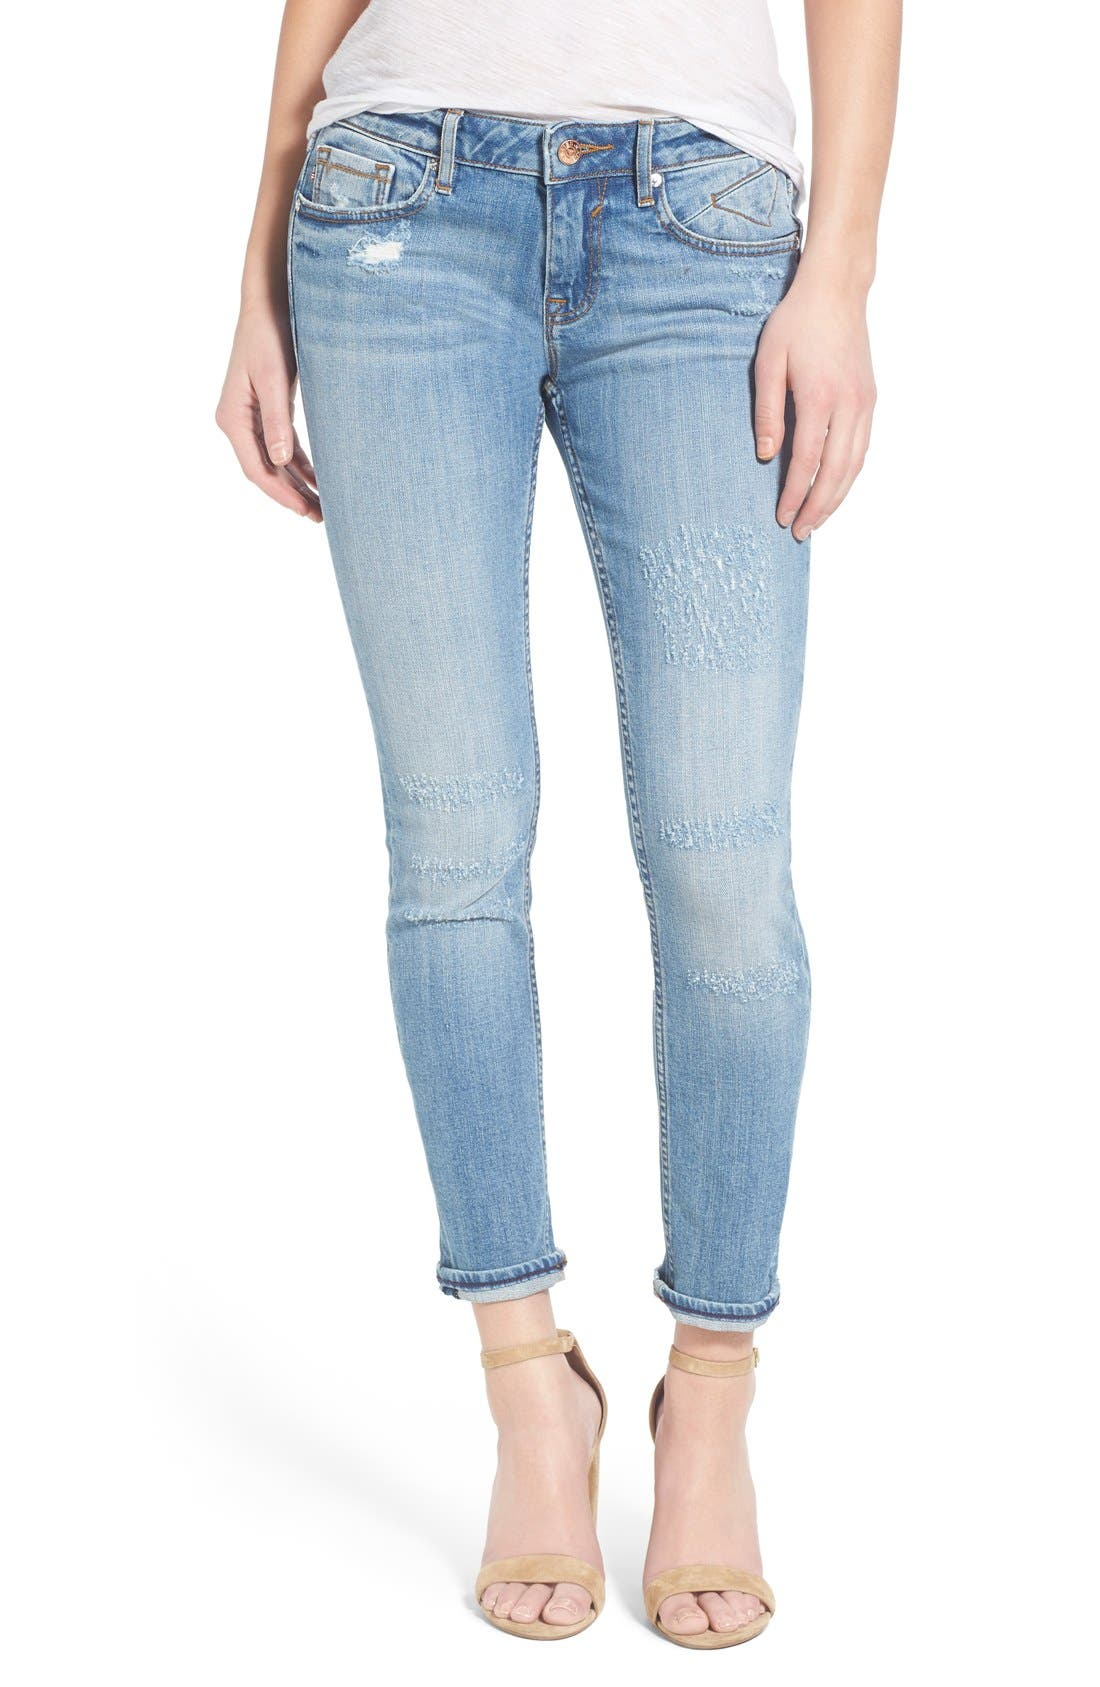 Alternate Image 1 Selected - Vigoss 'Tomboy 'Thompson' Distressed Boyfriend Jeans